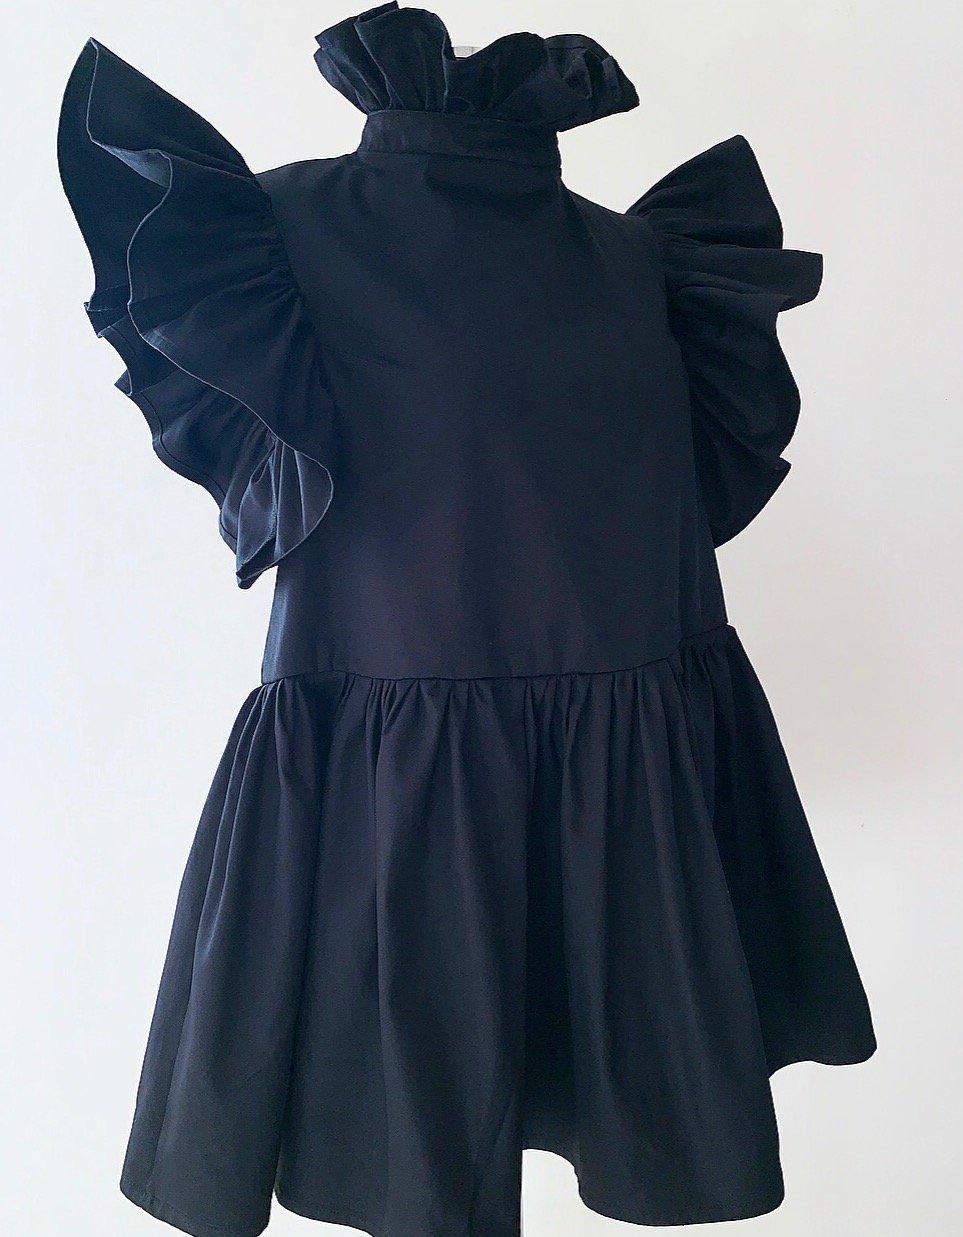 Image of  V O L A N T - Dress / Black